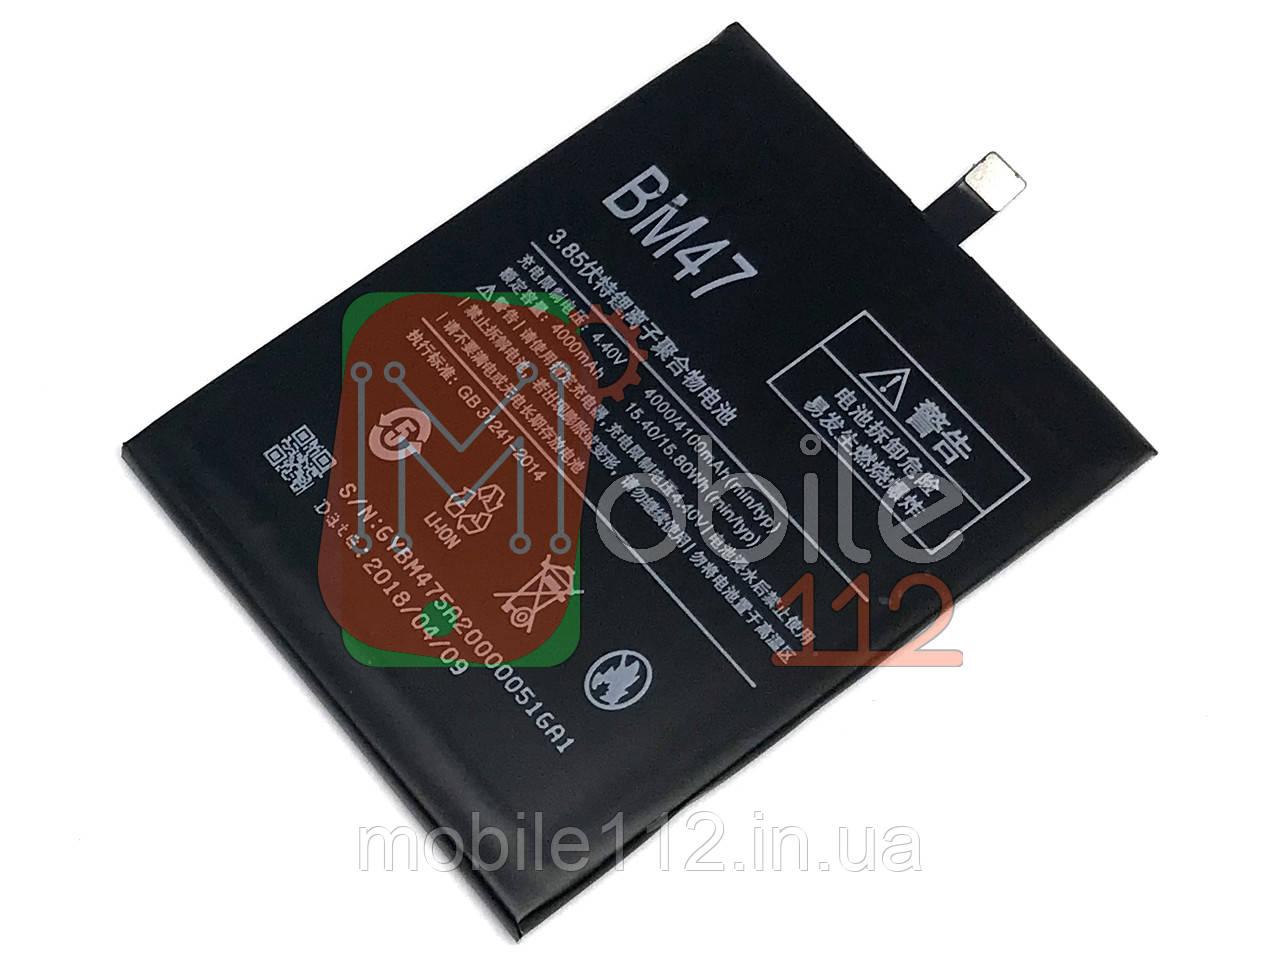 Аккумулятор (АКБ батарея) Xiaomi BM47 кач AAA Redmi 3 Redmi 3 Pro Redmi 3S Redmi 3X Redmi 4X 4000/4100 mAh